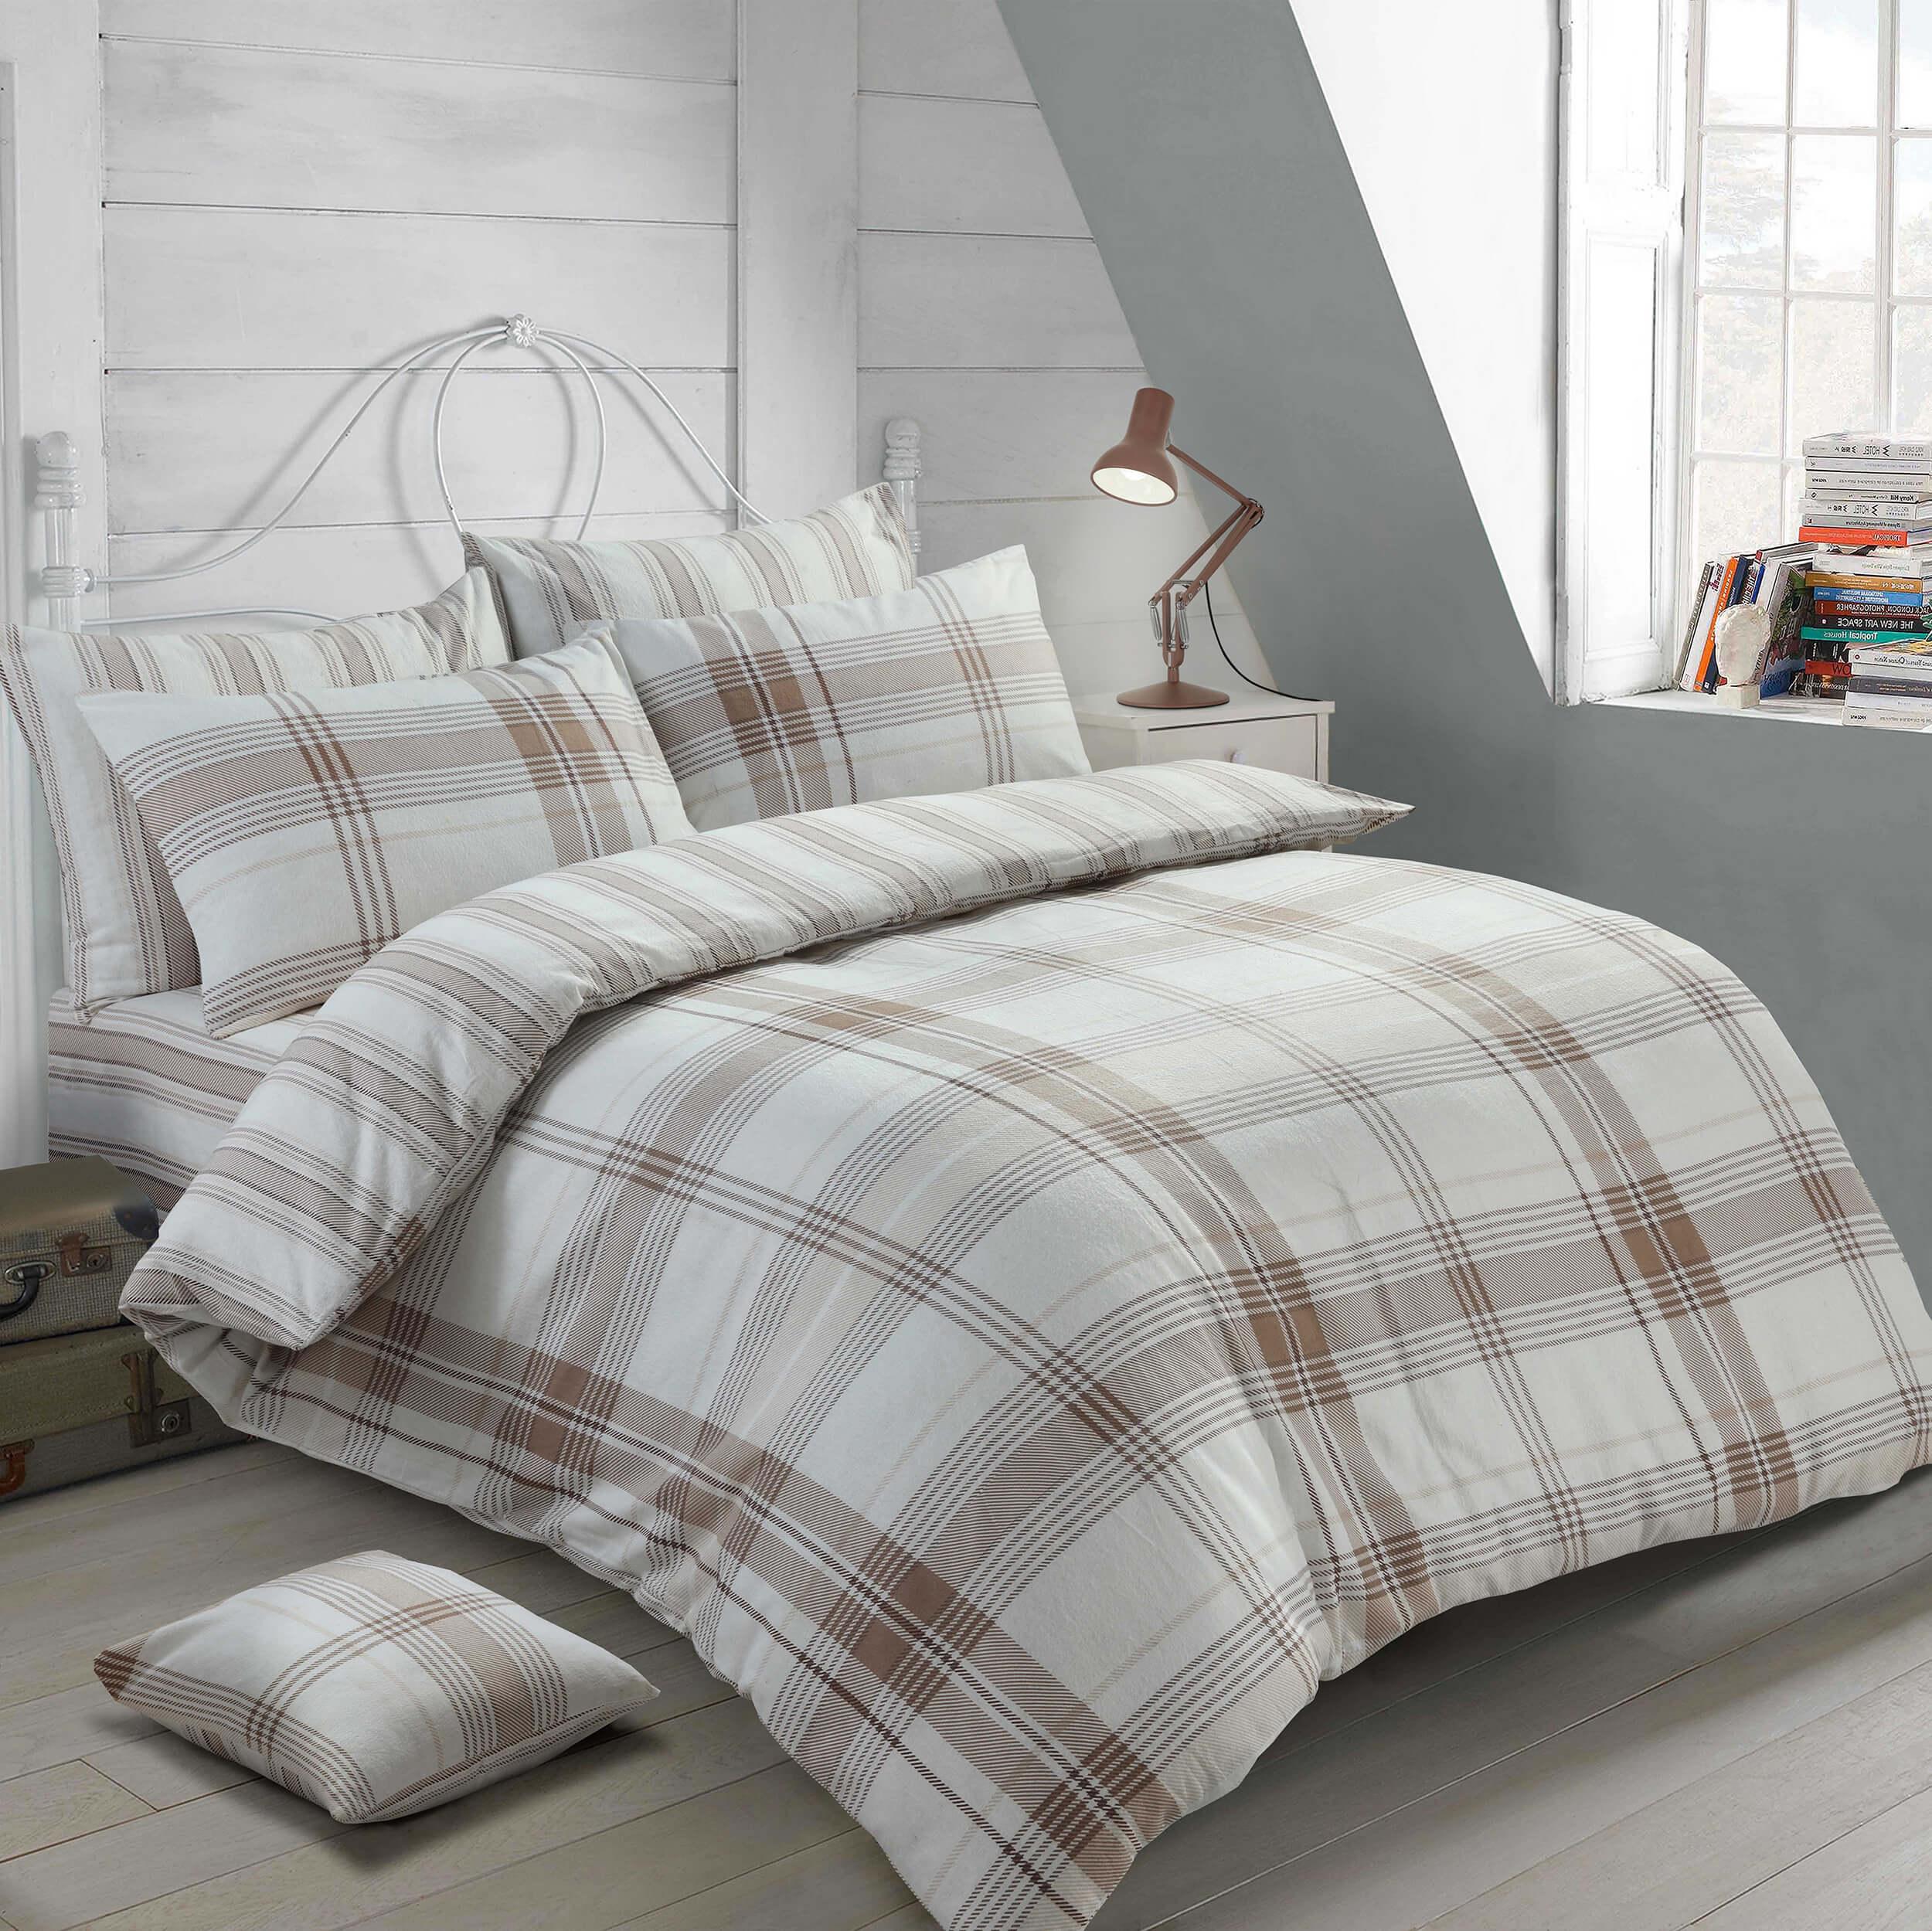 Double Bed Burlington Flannel Sheet Set The Bedlinen Company Cork